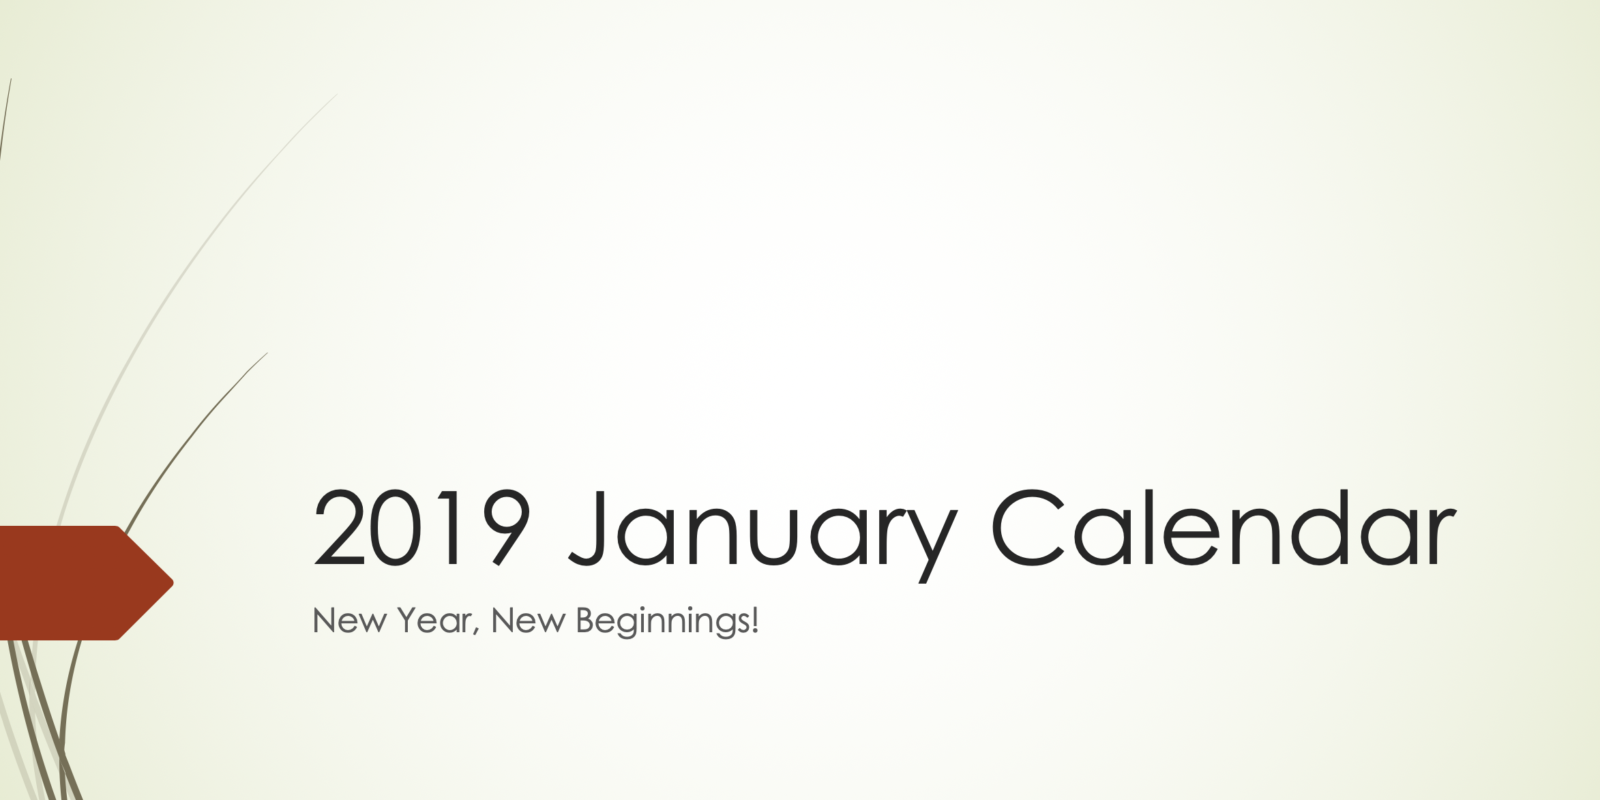 January 2019 Event Calendar